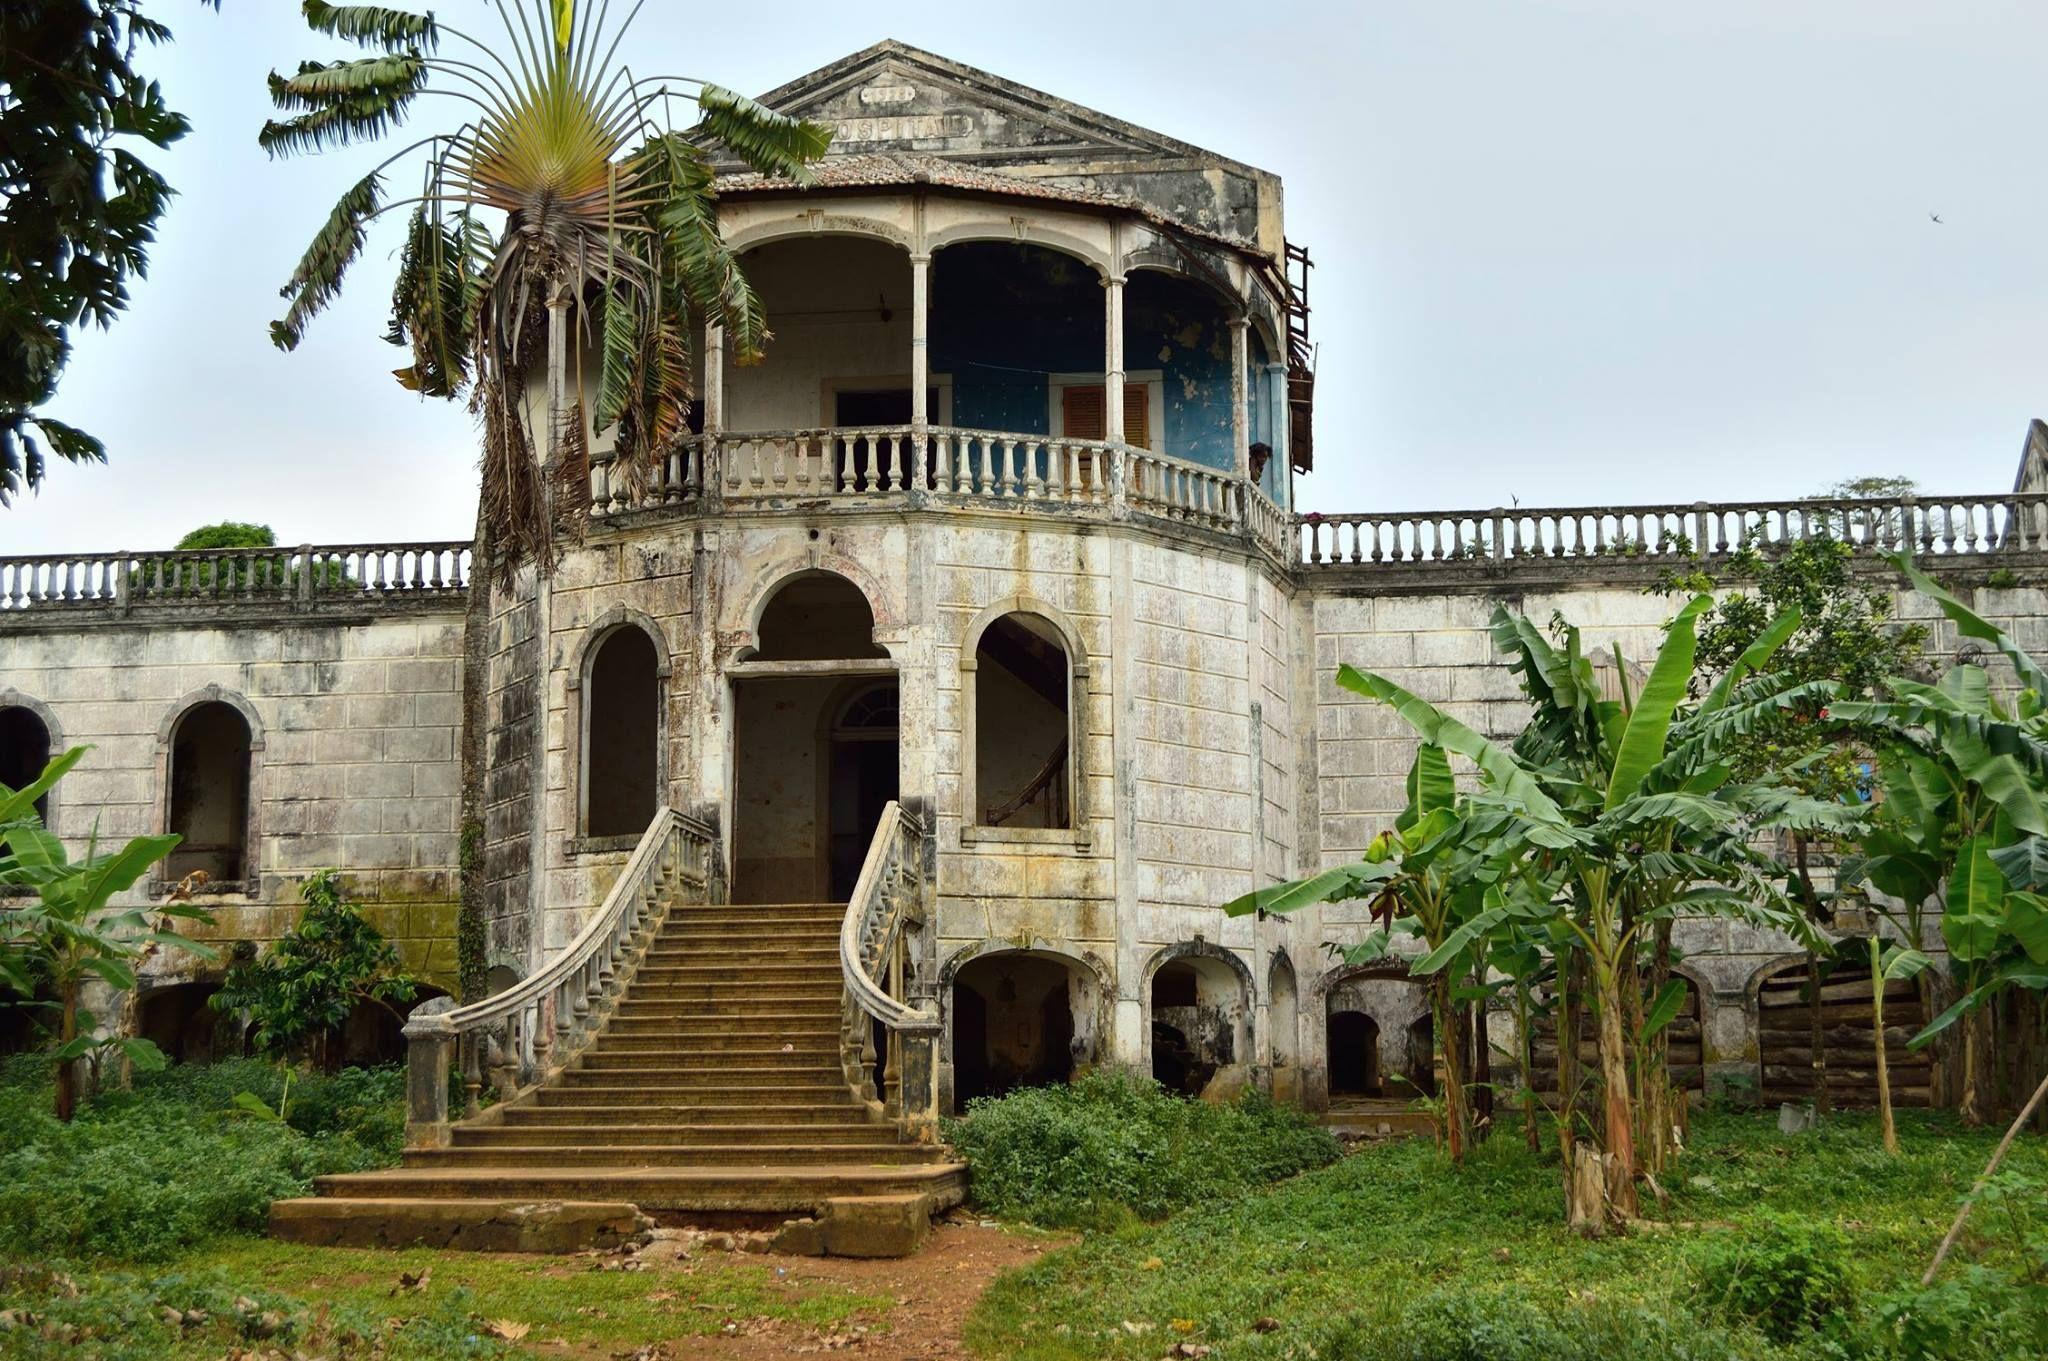 Abandoned Hospital At Roca Agua Ize Sao Tome And Principe Taken